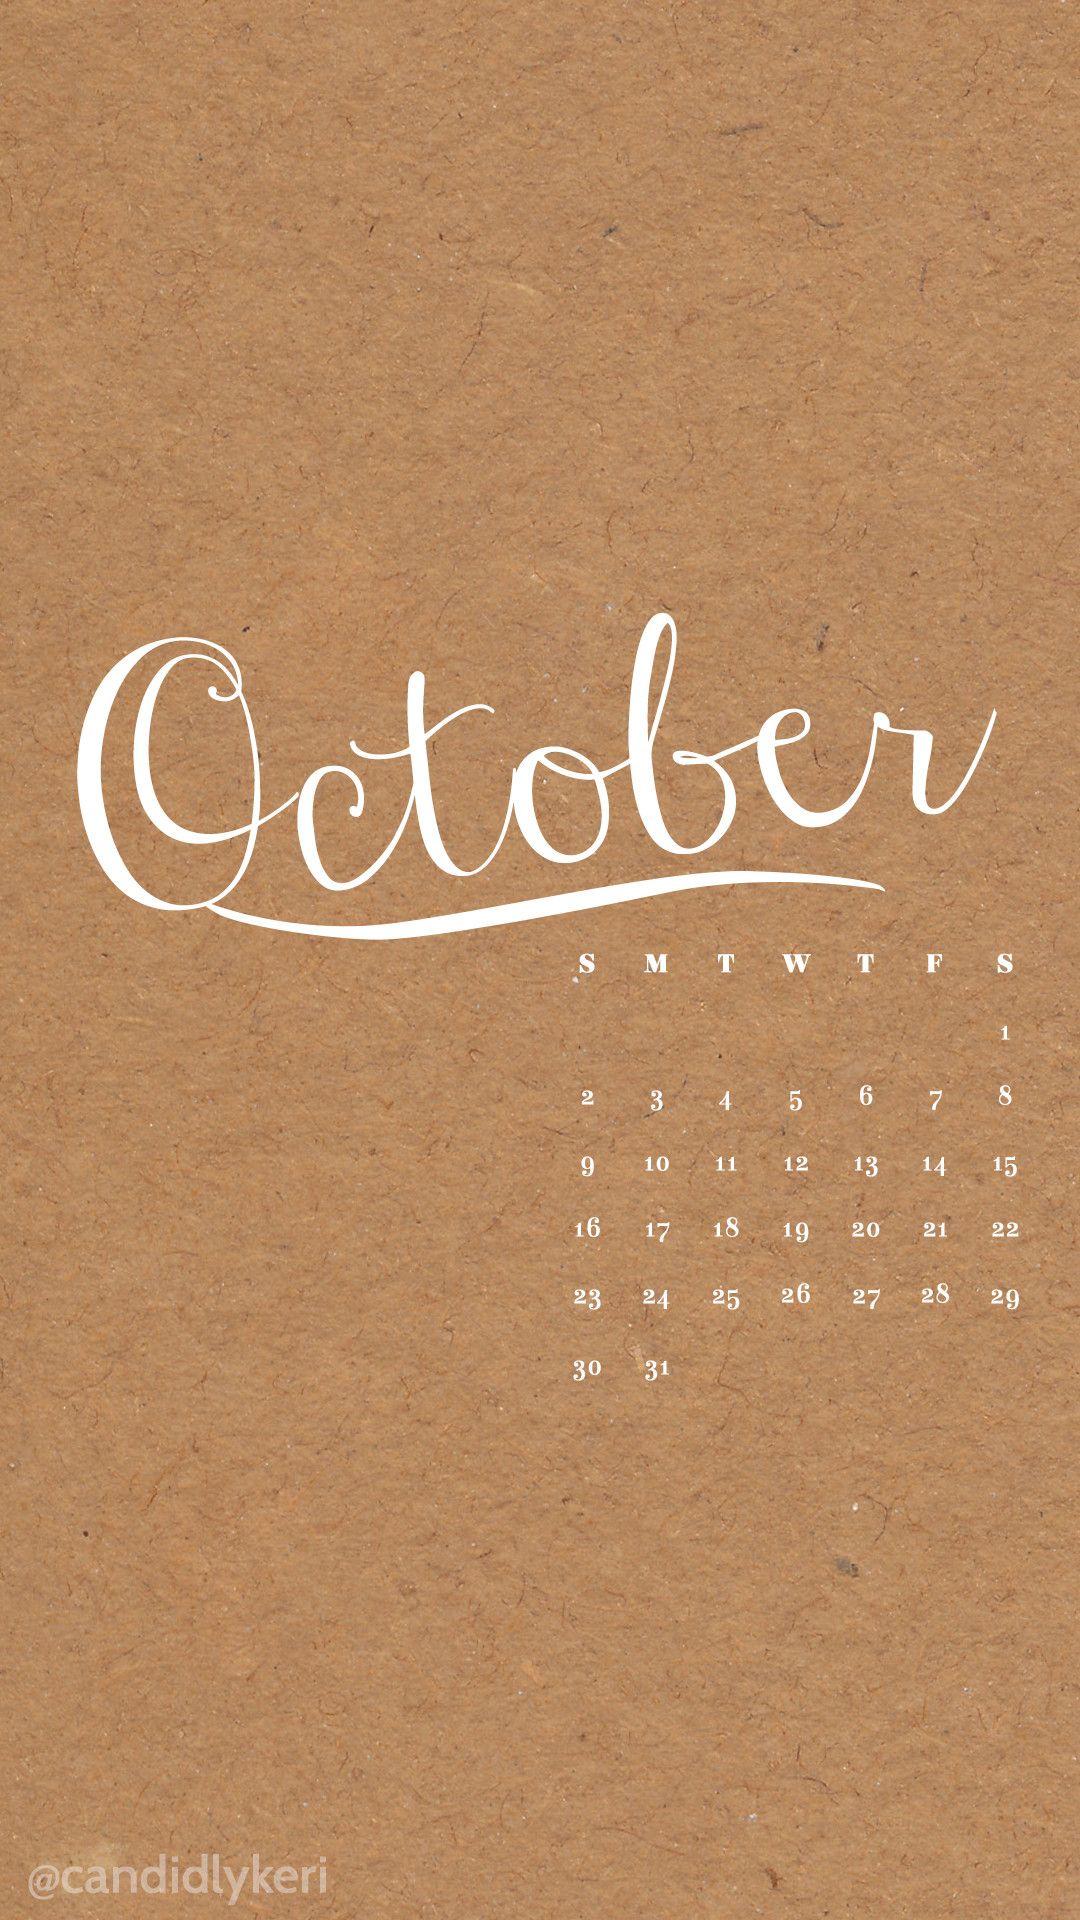 Desktop Wallpapers Calendar October 2018 57 images #octoberwallpaperiphone